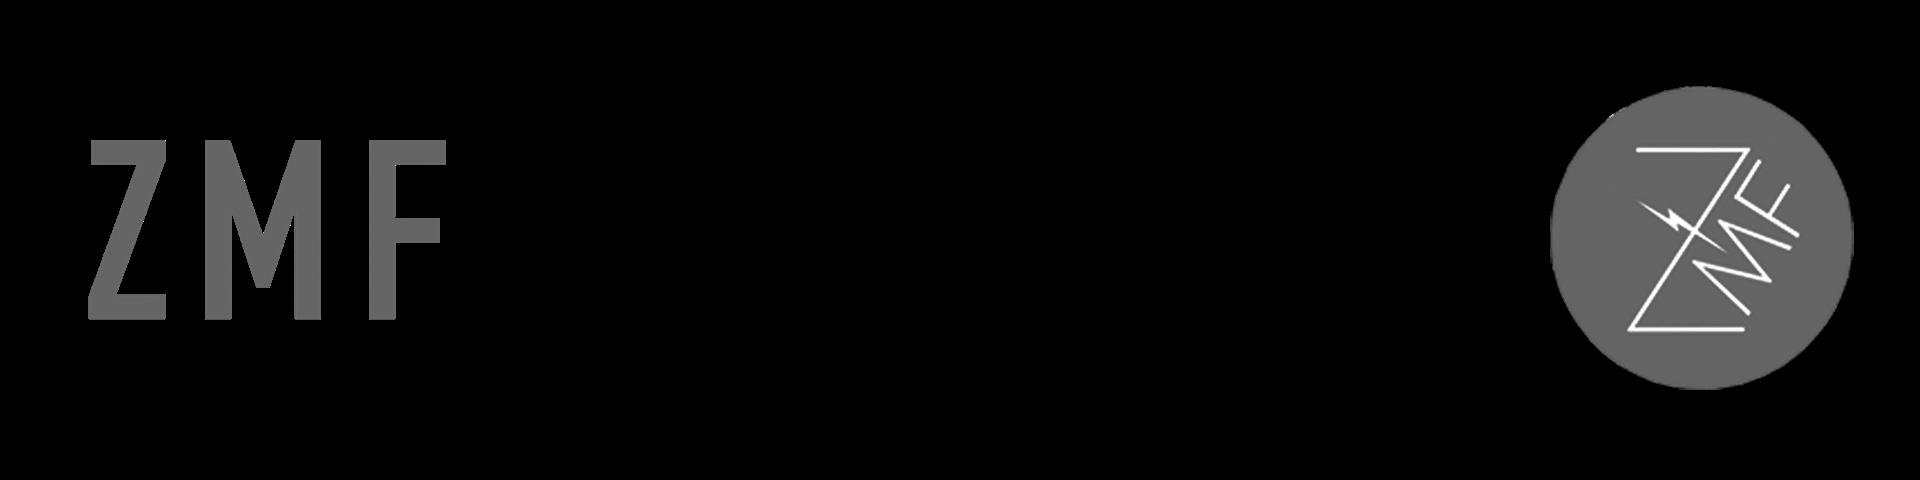 PhotoGallery_6185896_ZMF Logo bw